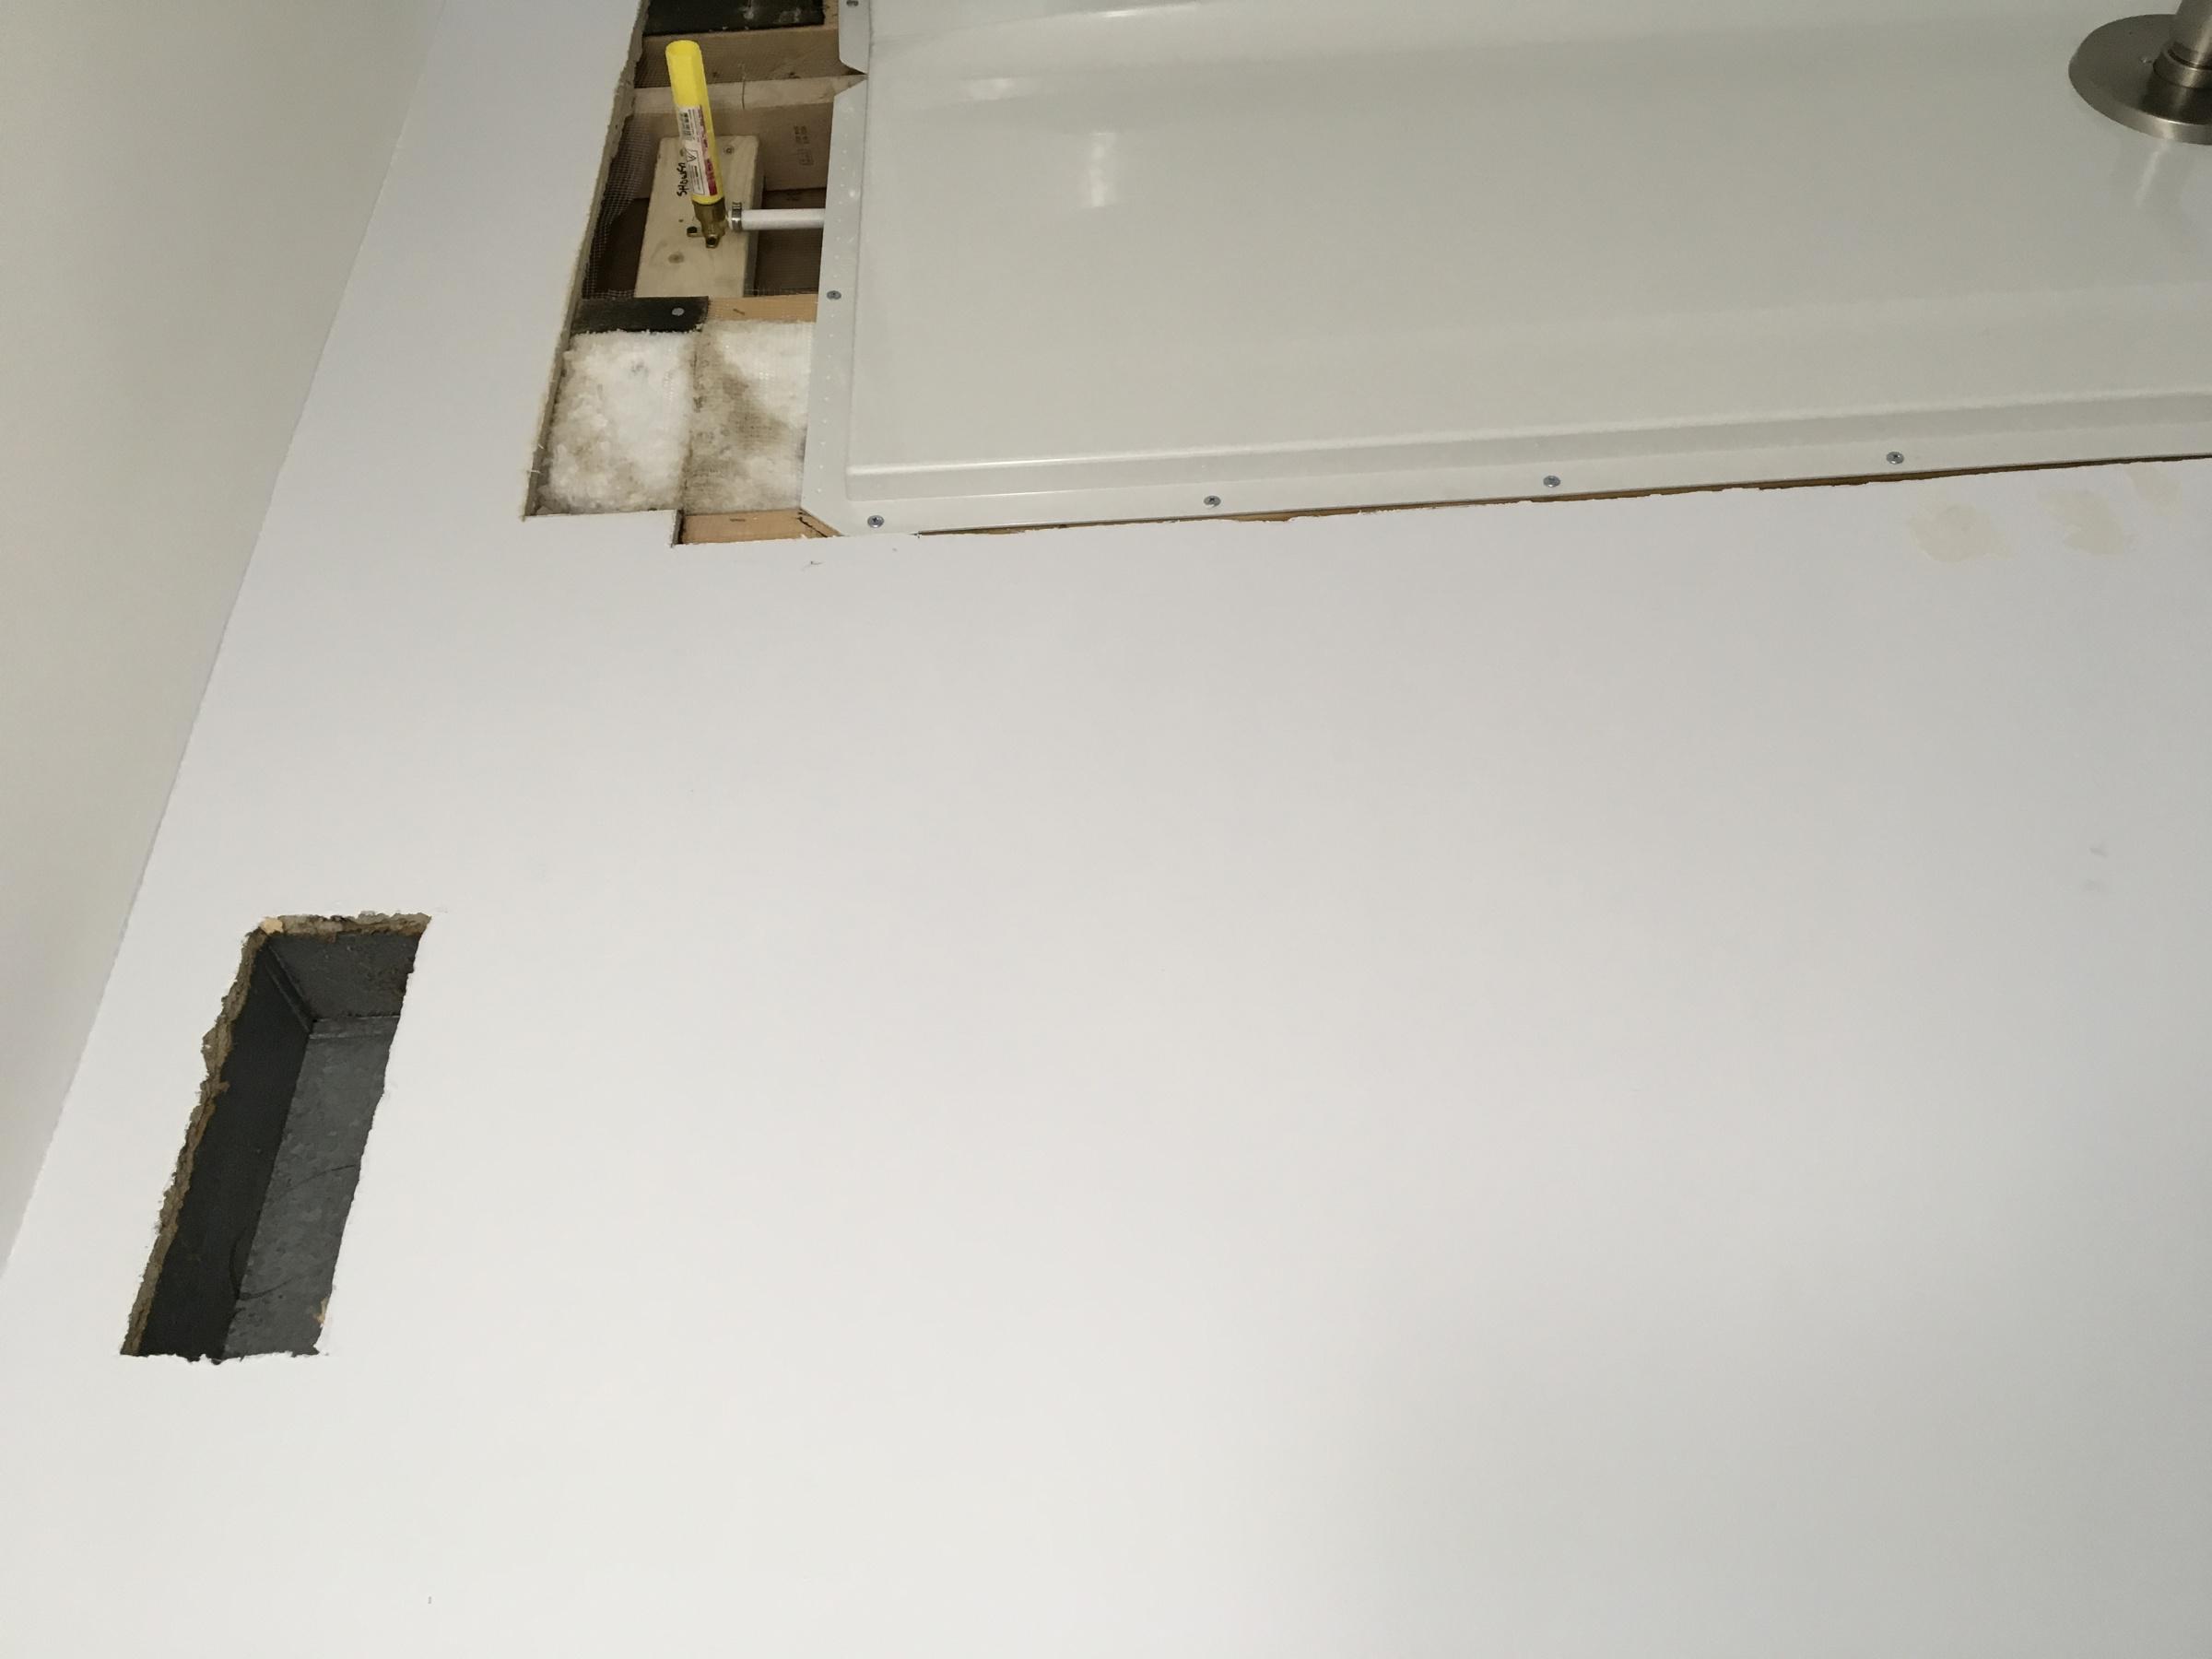 Impossible drywall around tub surround-89fed25b-5c43-4c8c-a373-767530e5fdf8.jpg